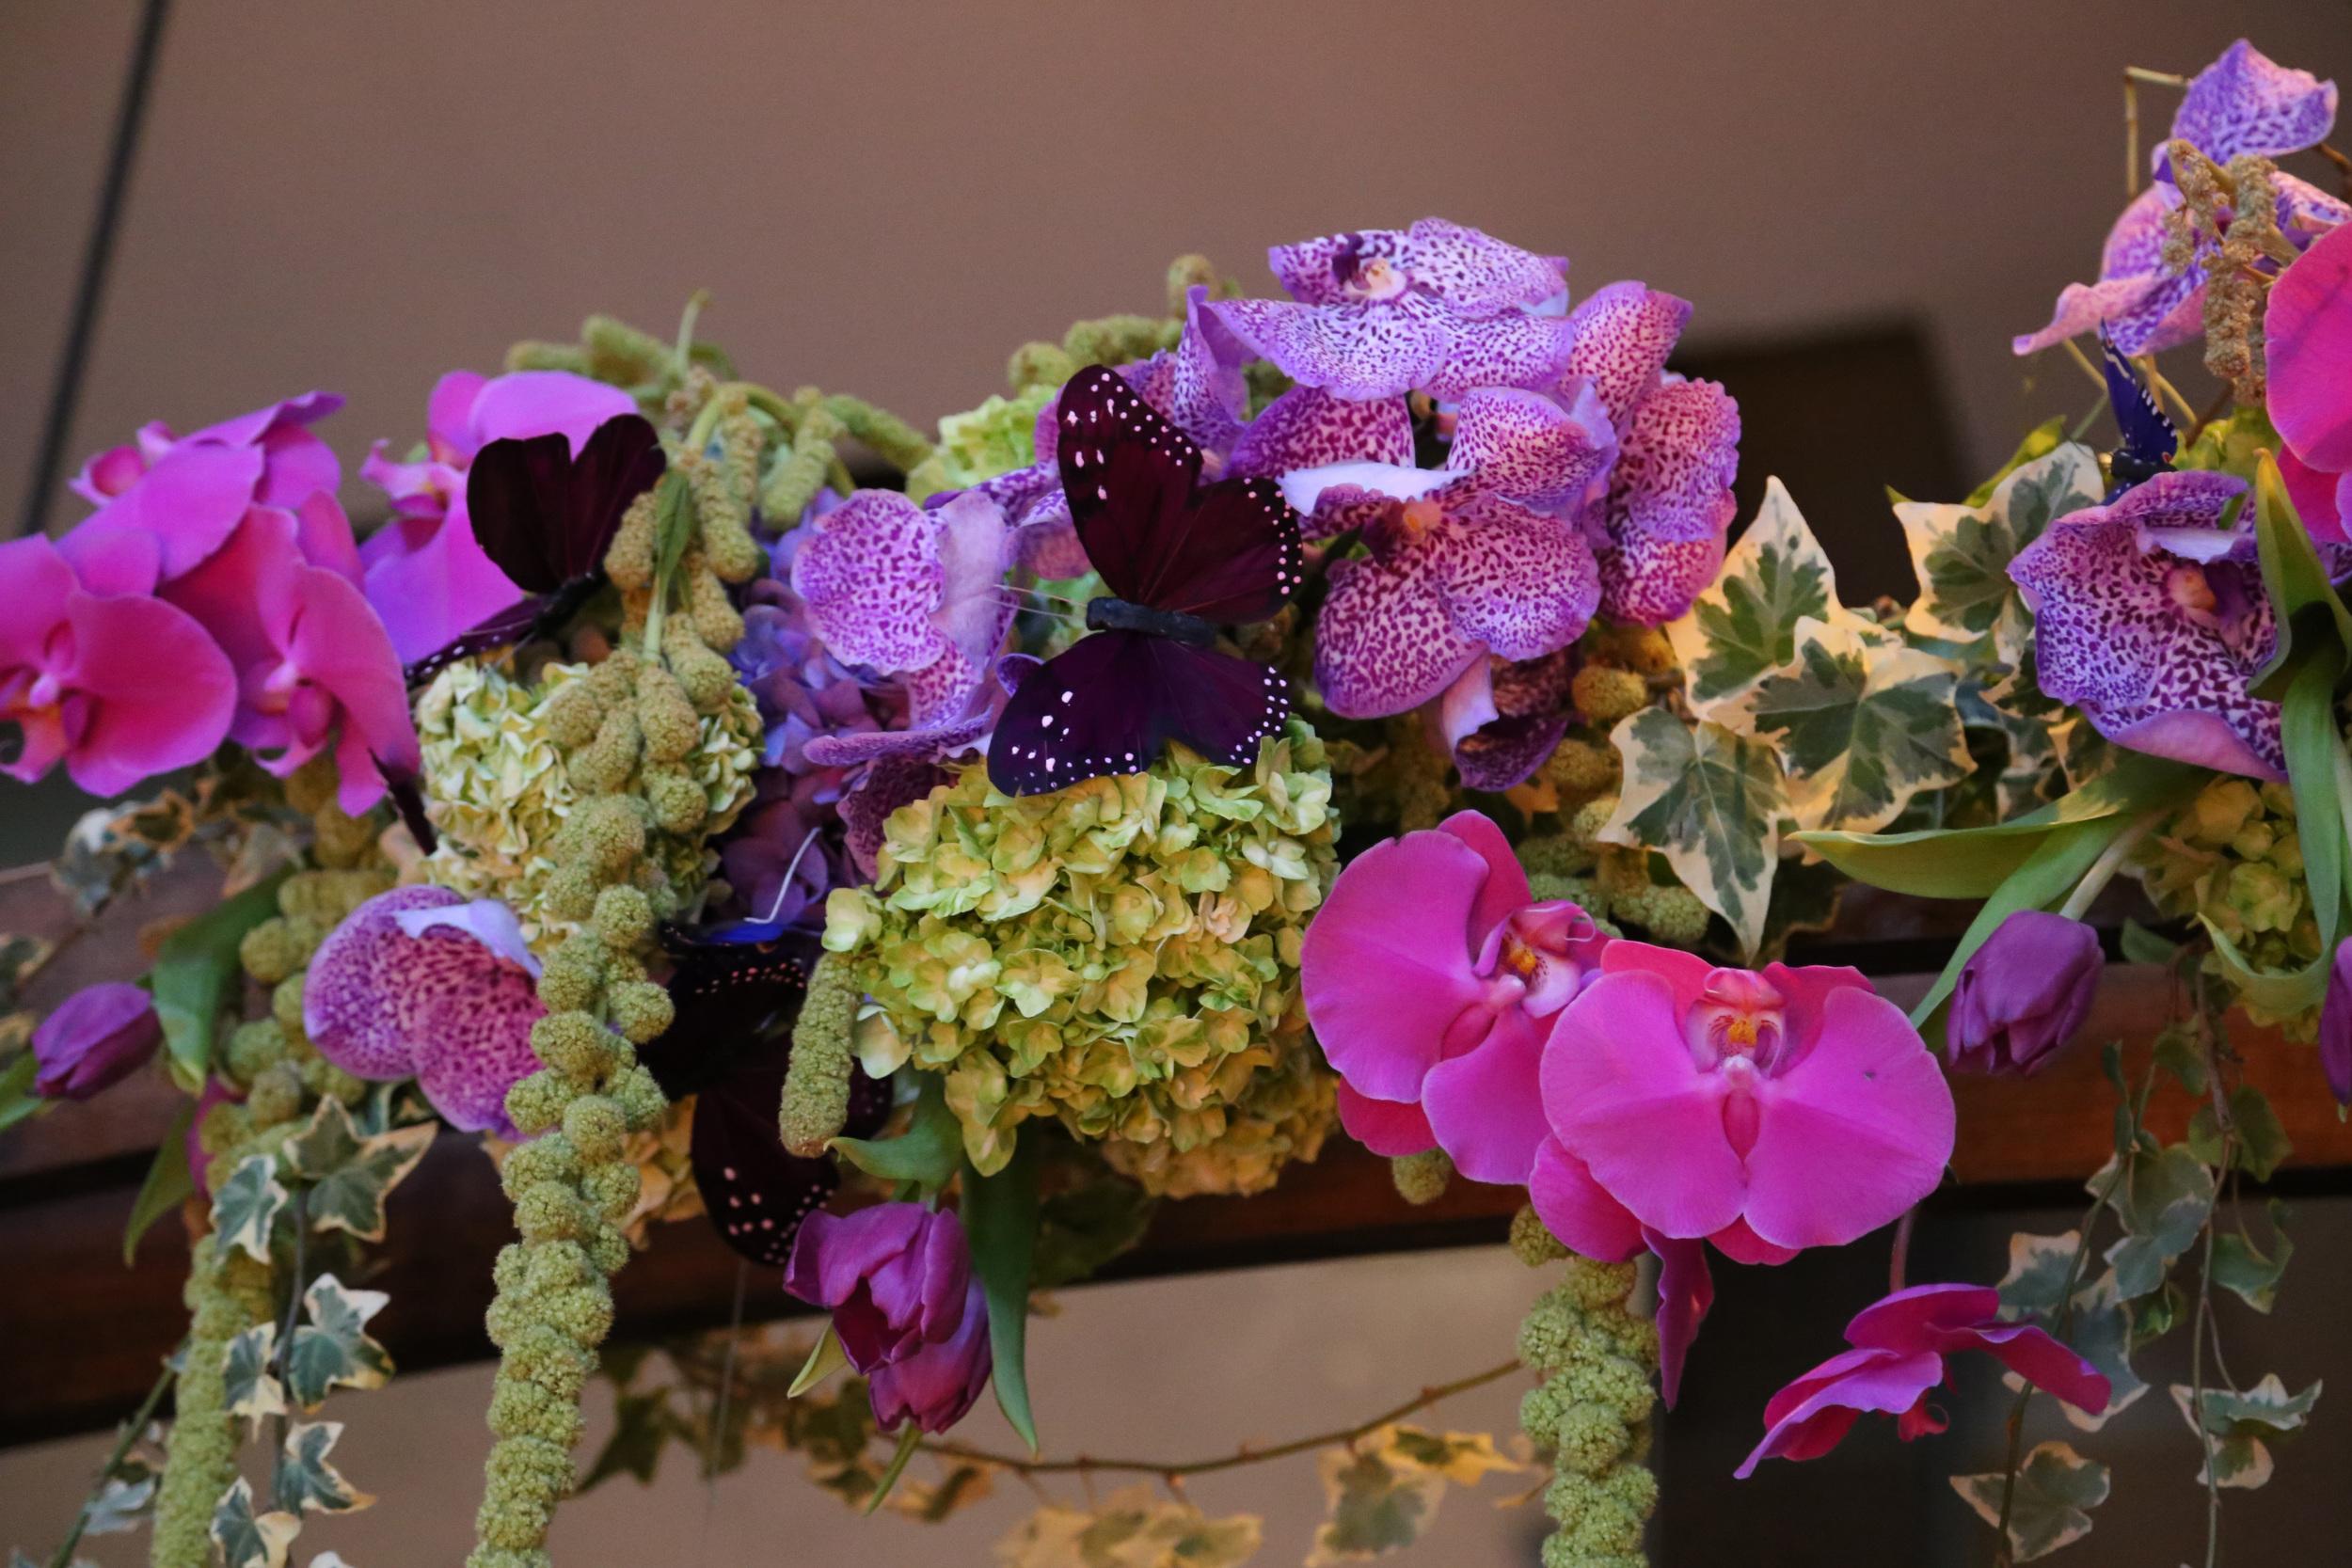 mandarin_oriental_new_york_city_branding_inspiration_lavender_silver_wedding_floral_purple_v284_22.jpg